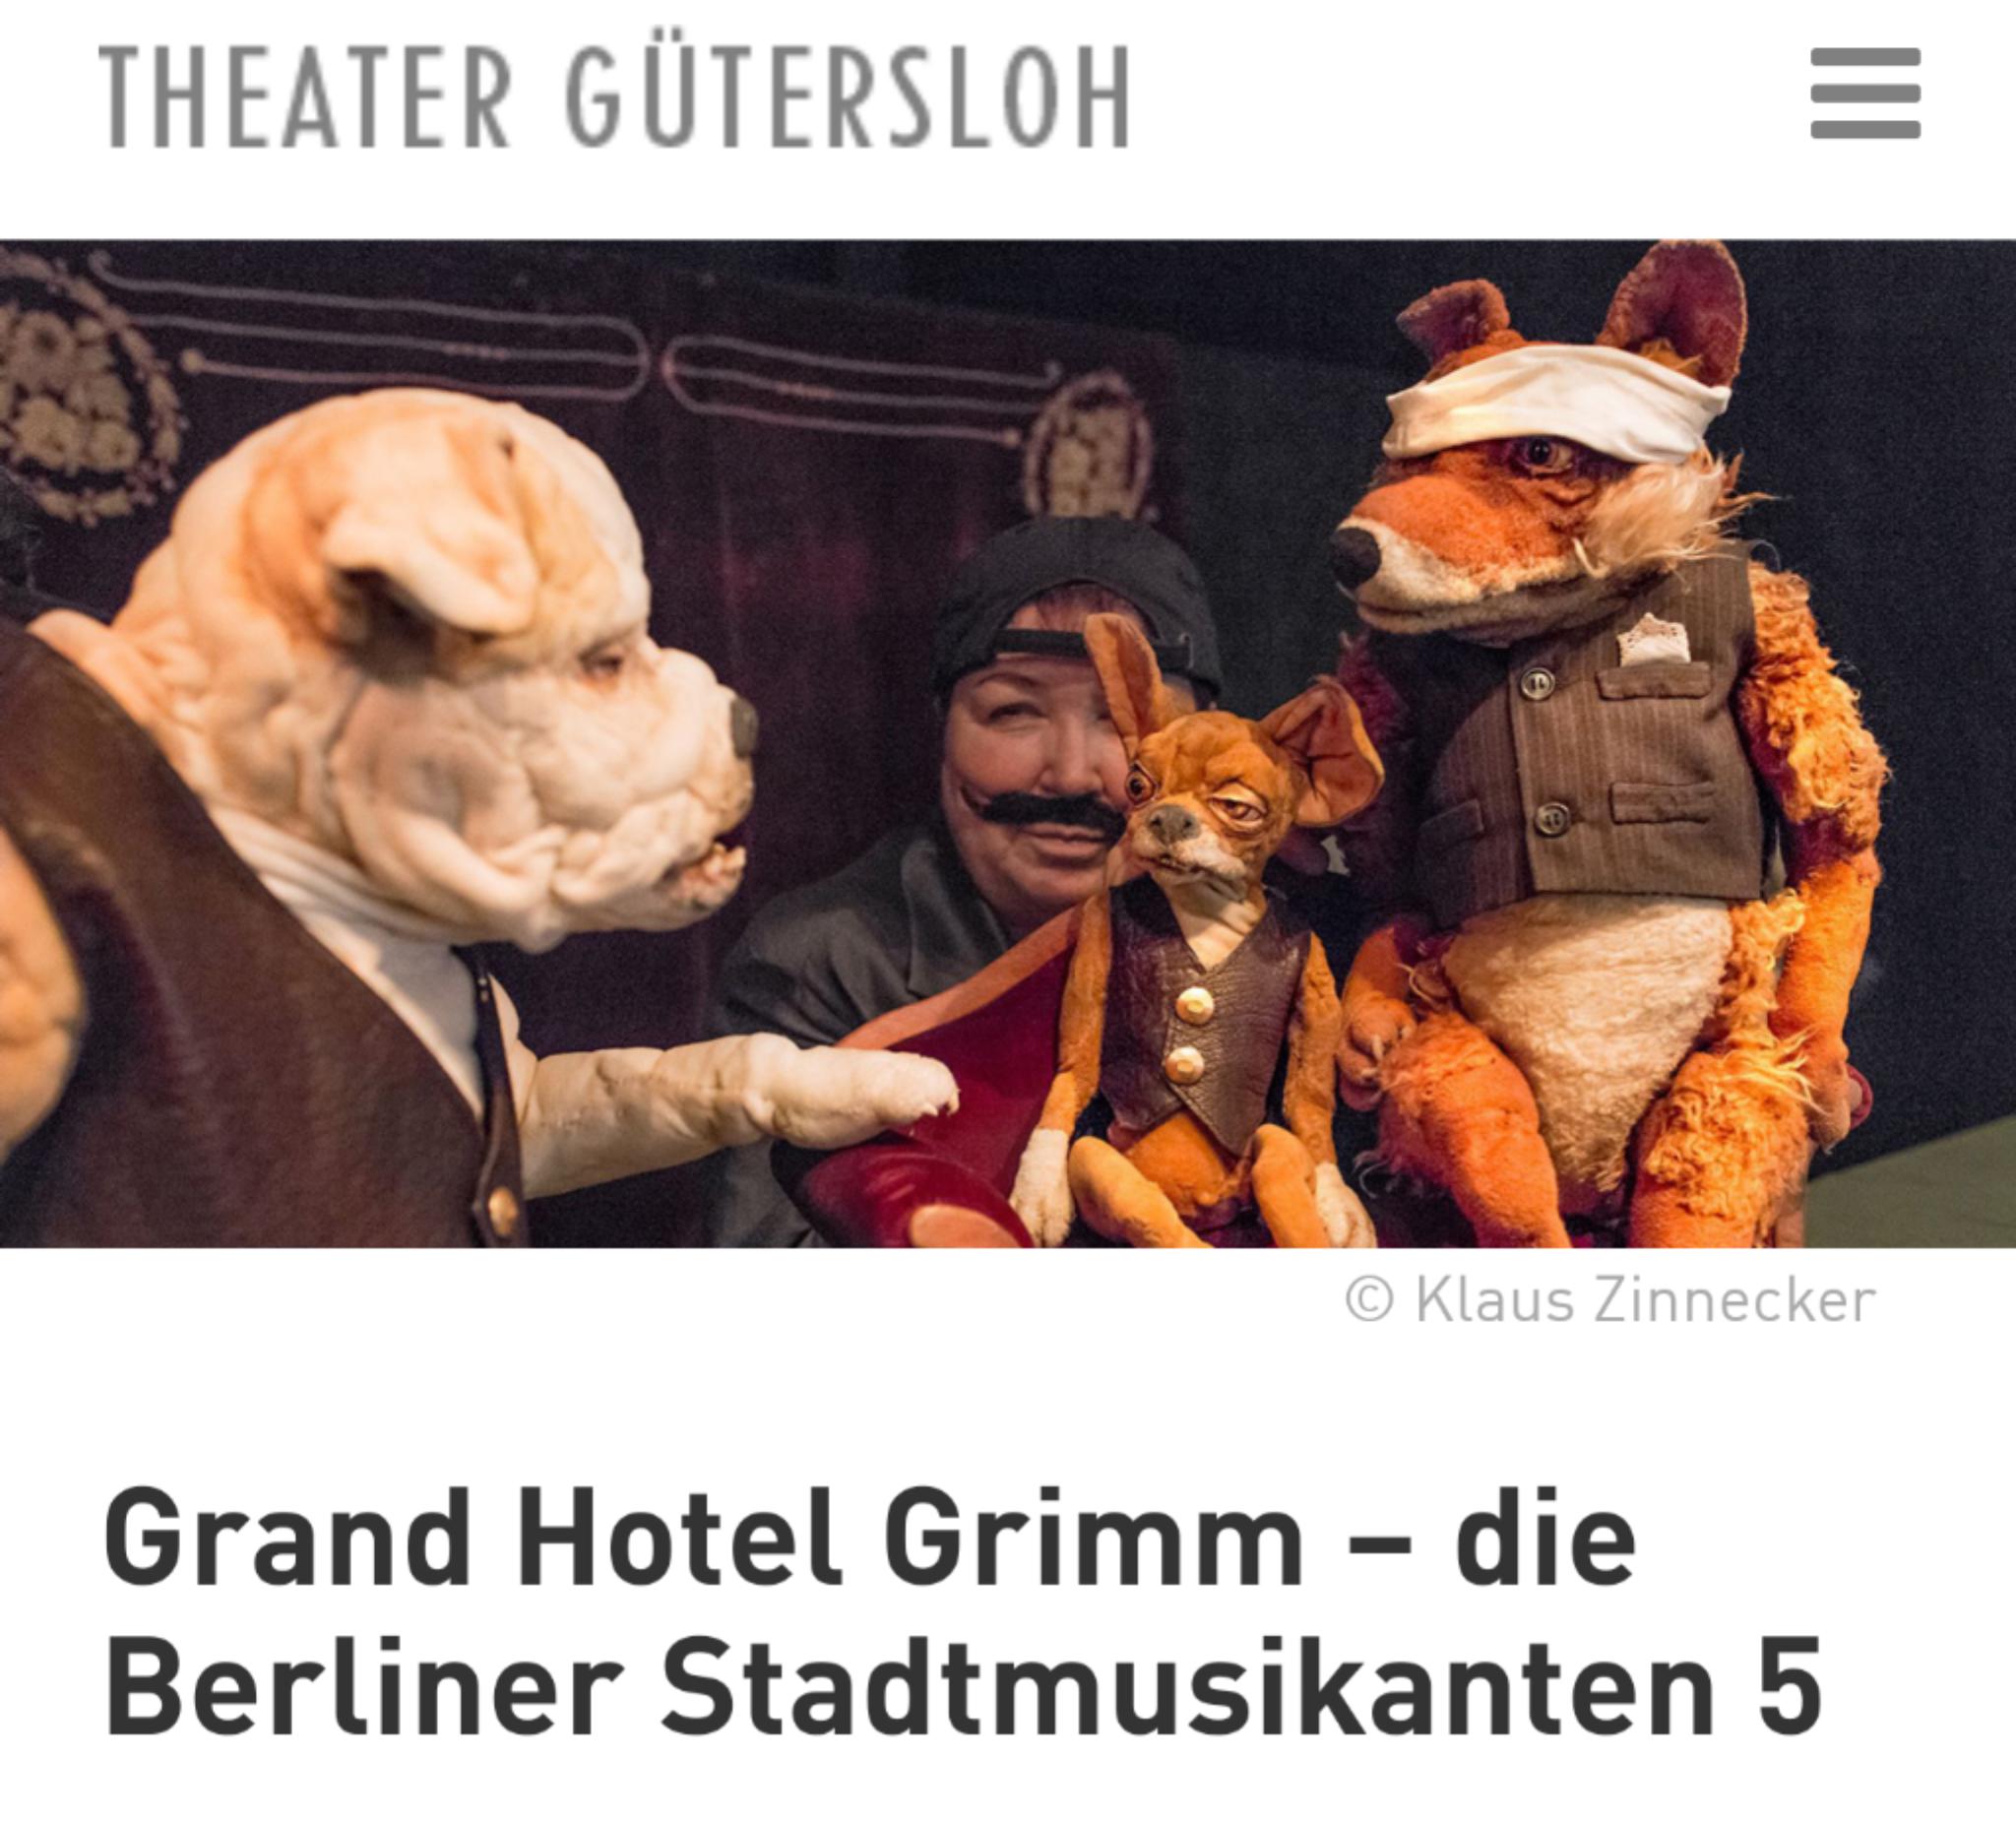 Gratis Theater Stream: Grand Hotel Grimm – die Berliner Stadtmusikanten 5